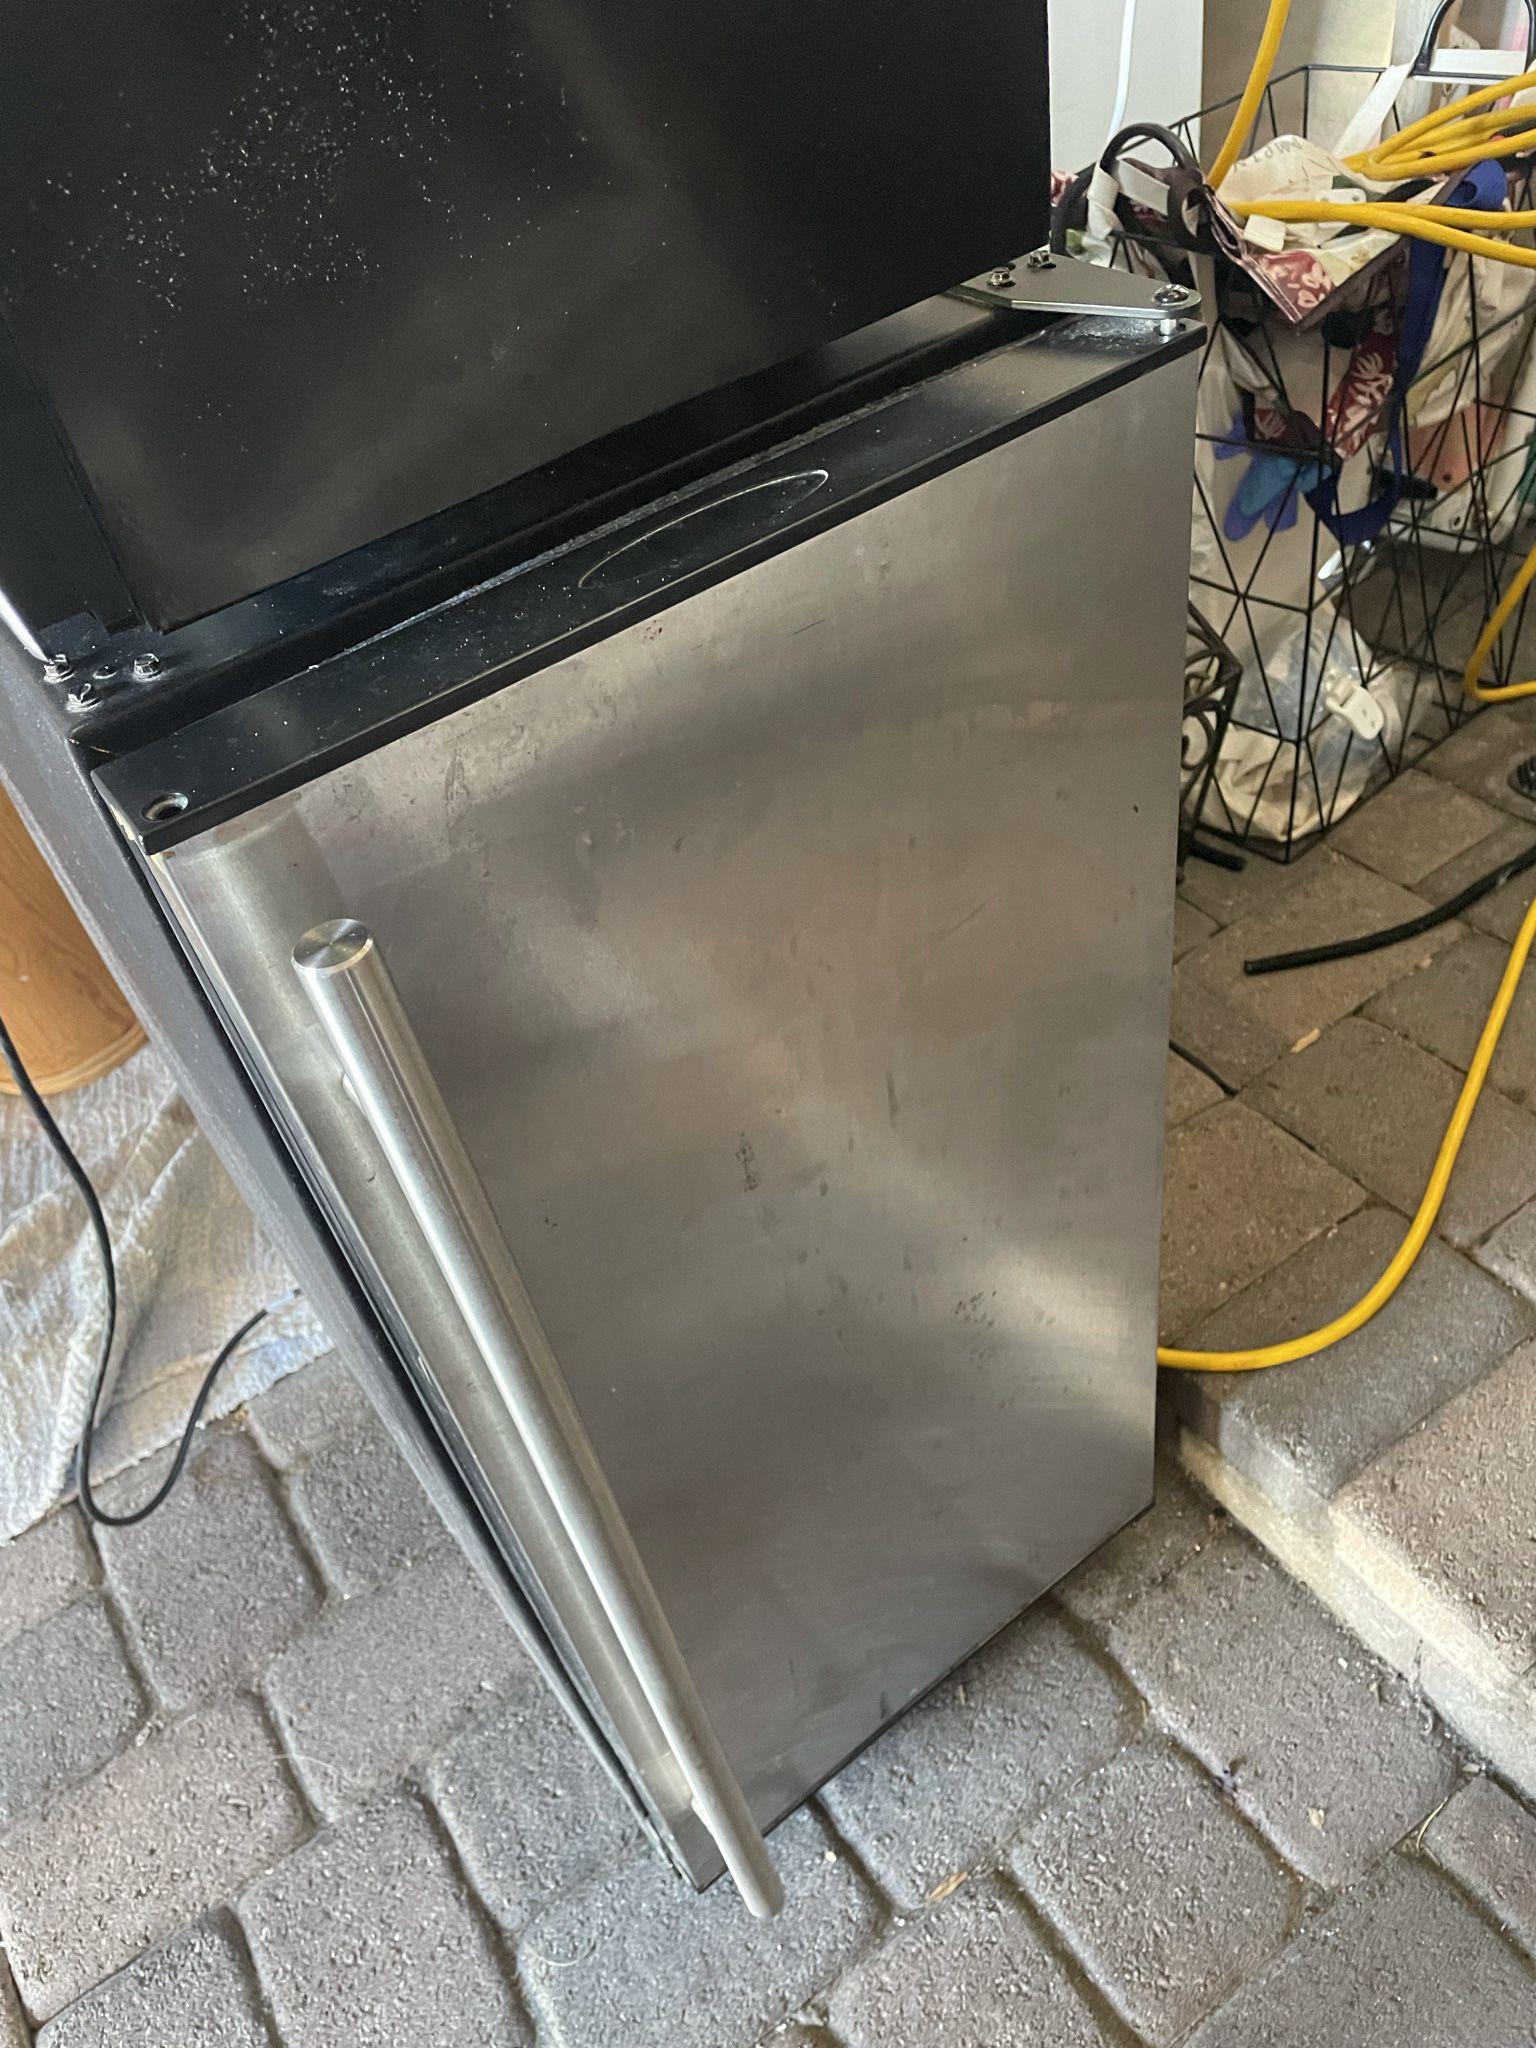 Mini refrigerator dorm room Clairemont Mesa